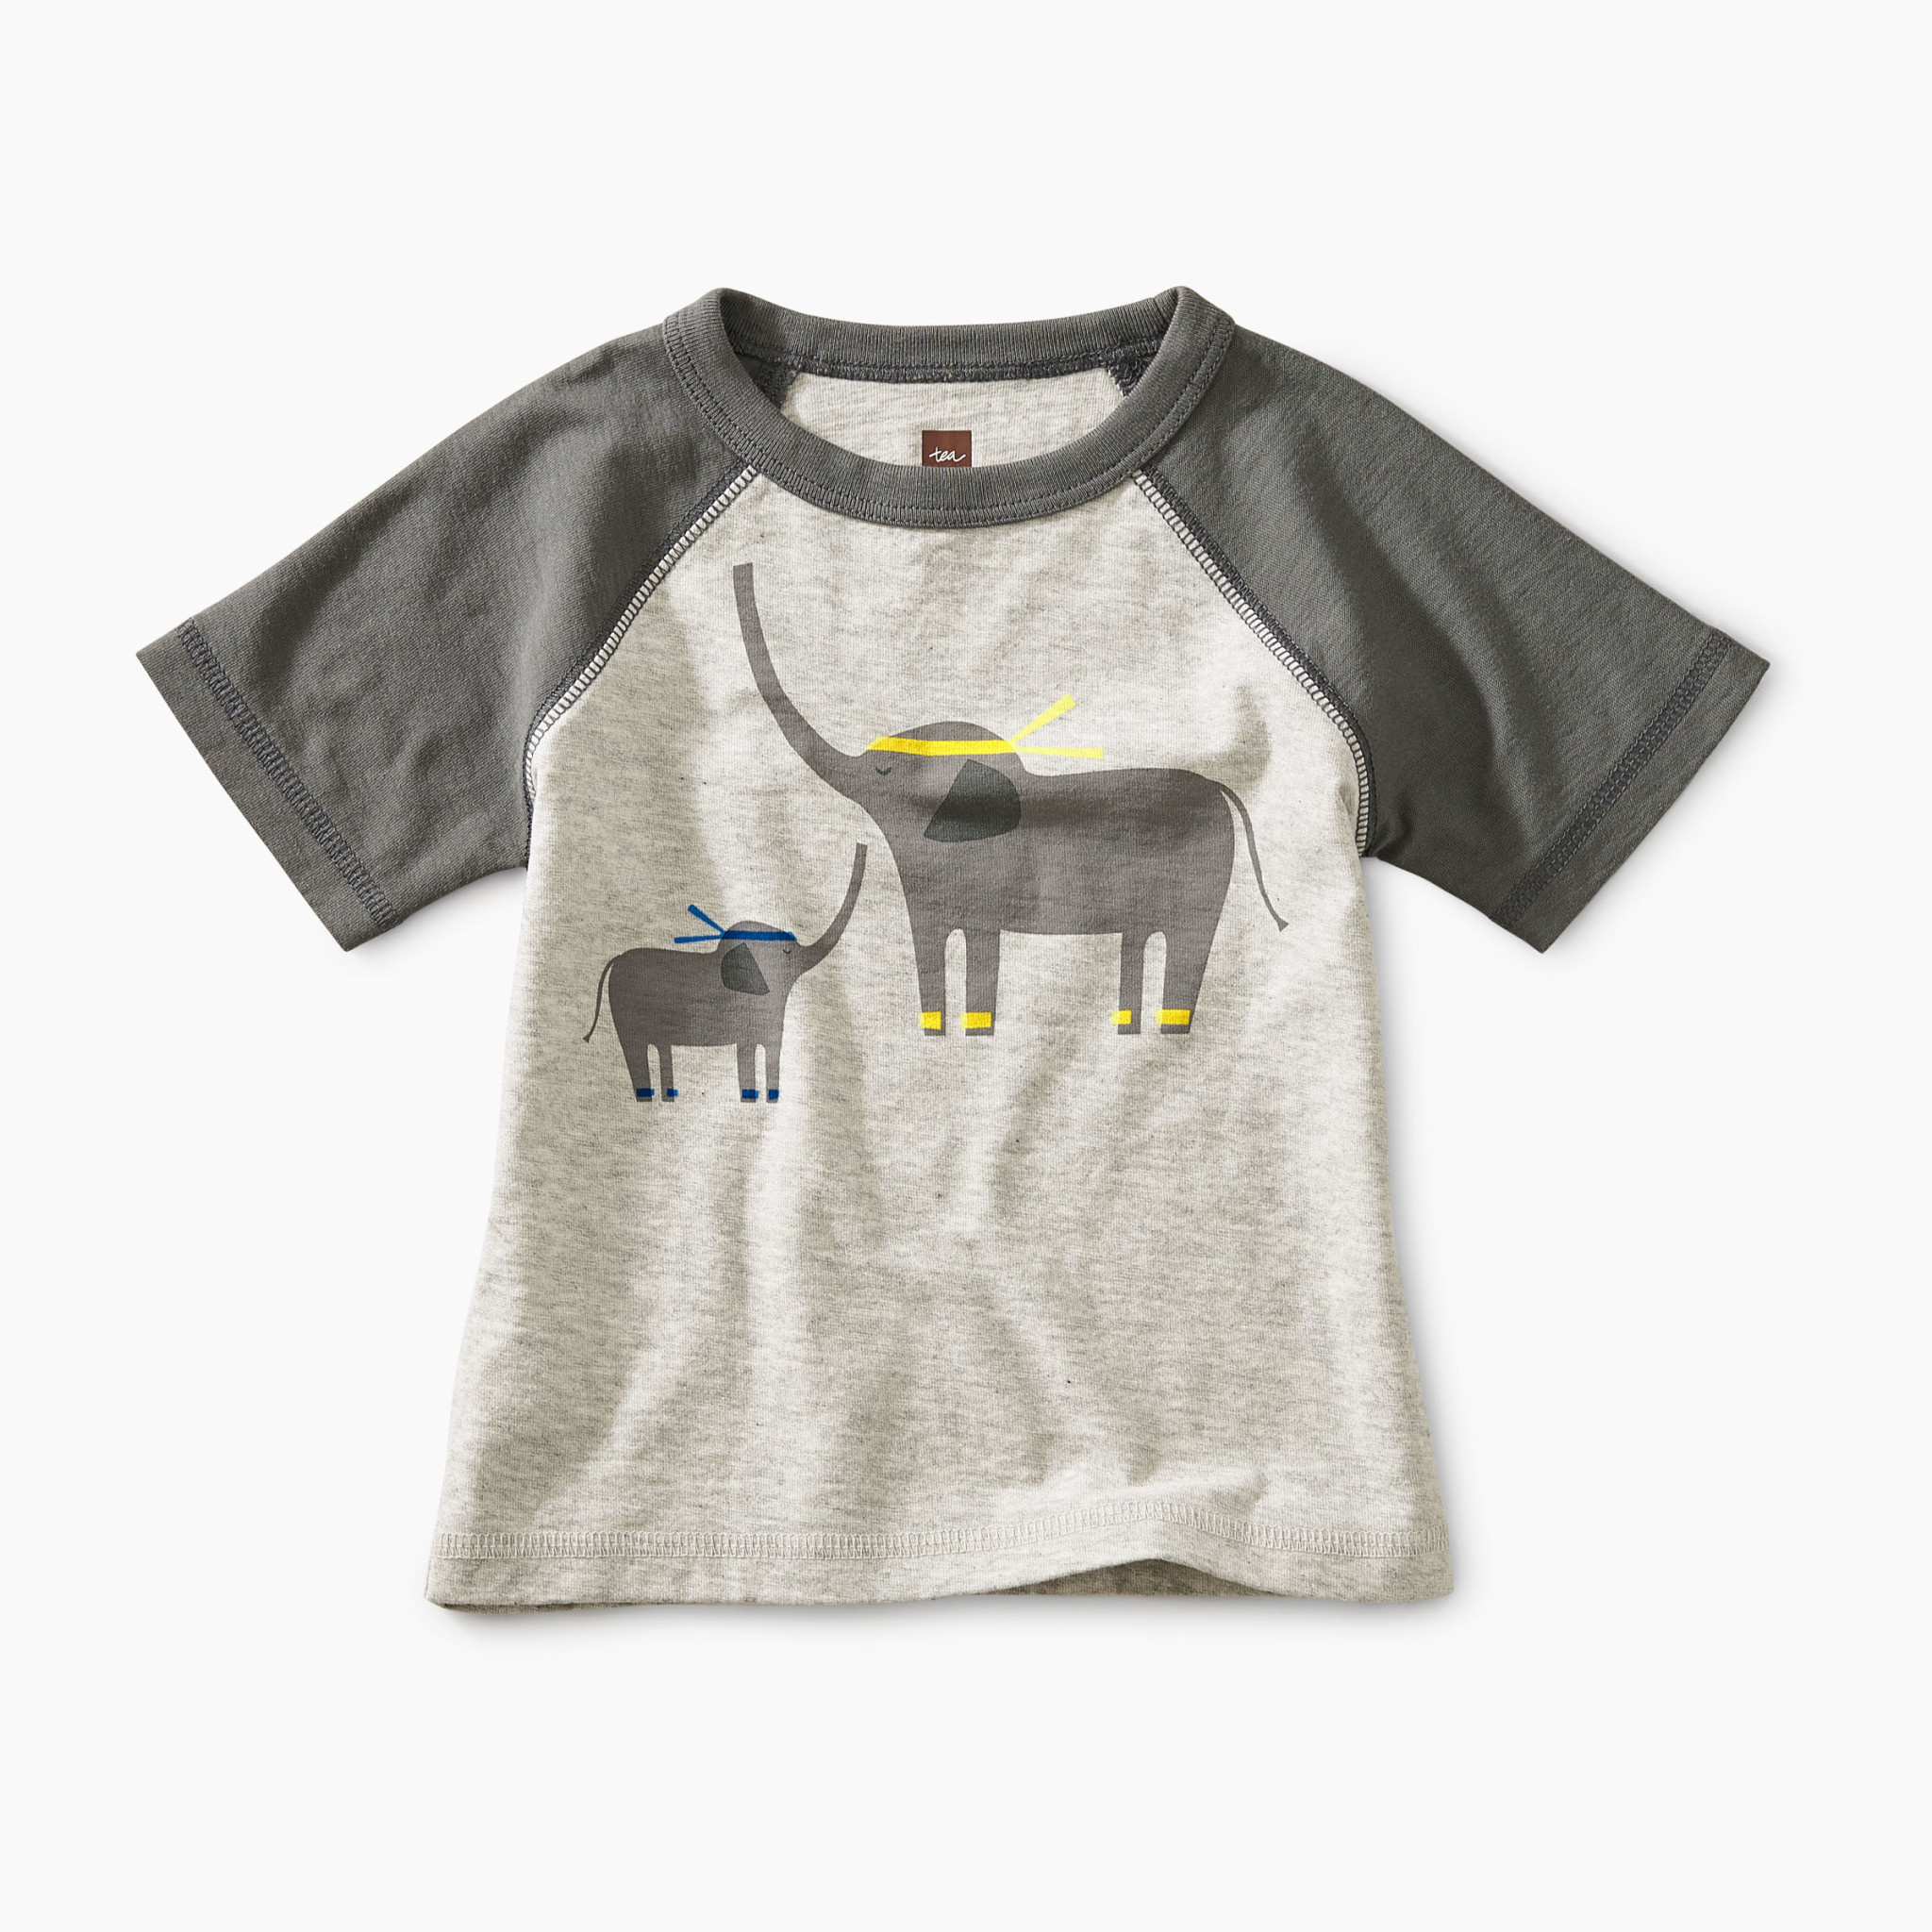 Tea Collection Martial Arts Elephant Baby Tee